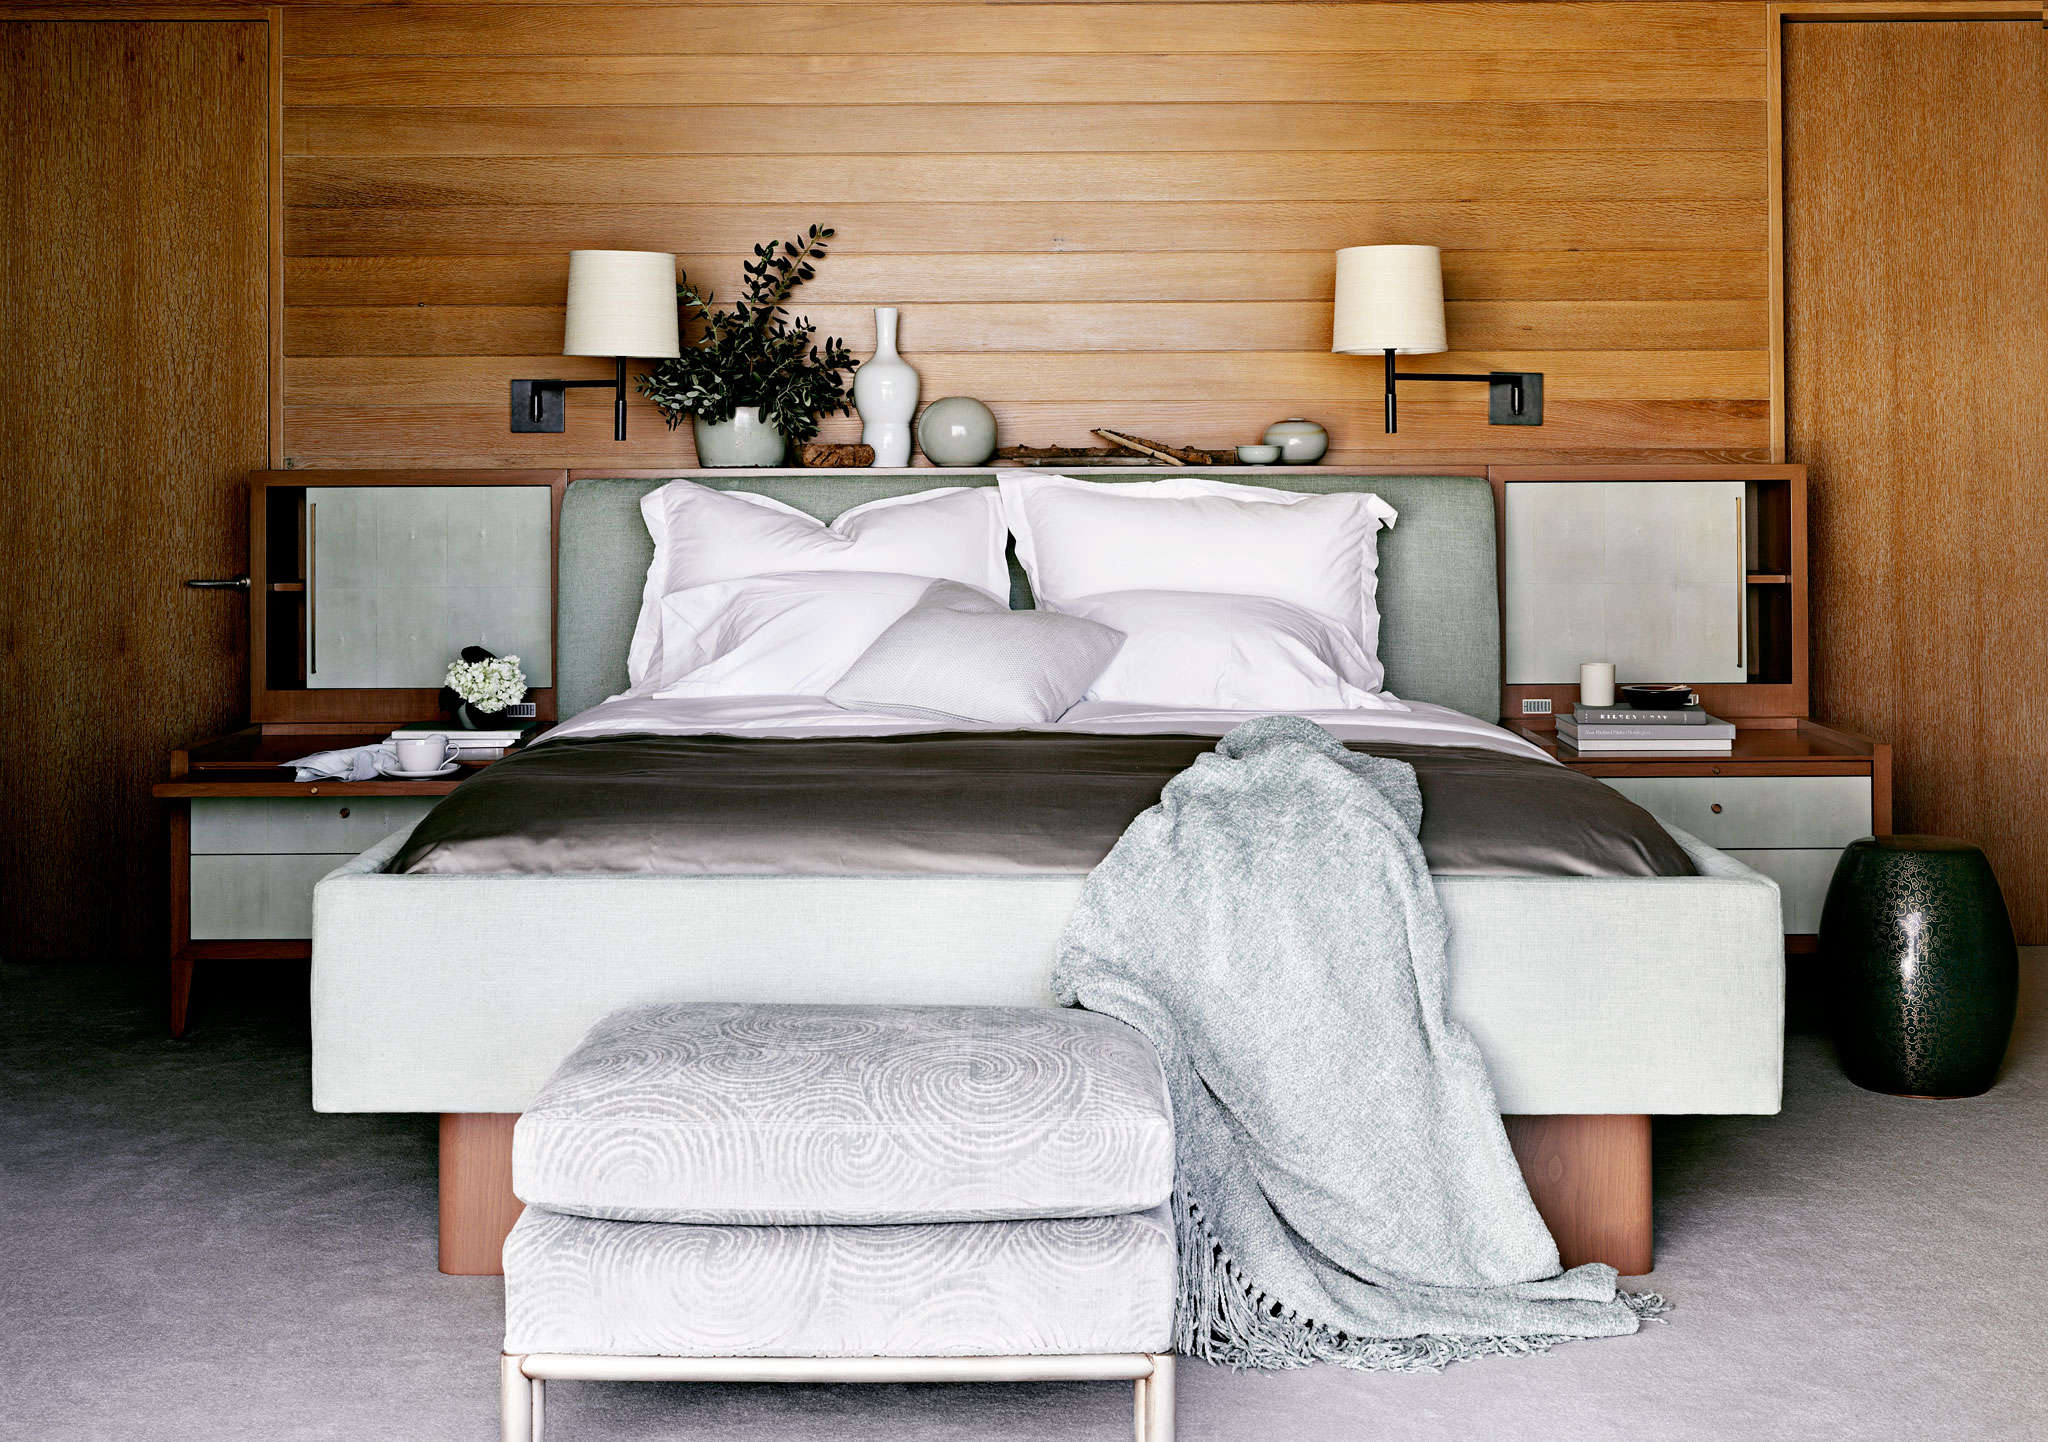 wood paneled romantic bedroom designed by barbara barry | remodelista 11